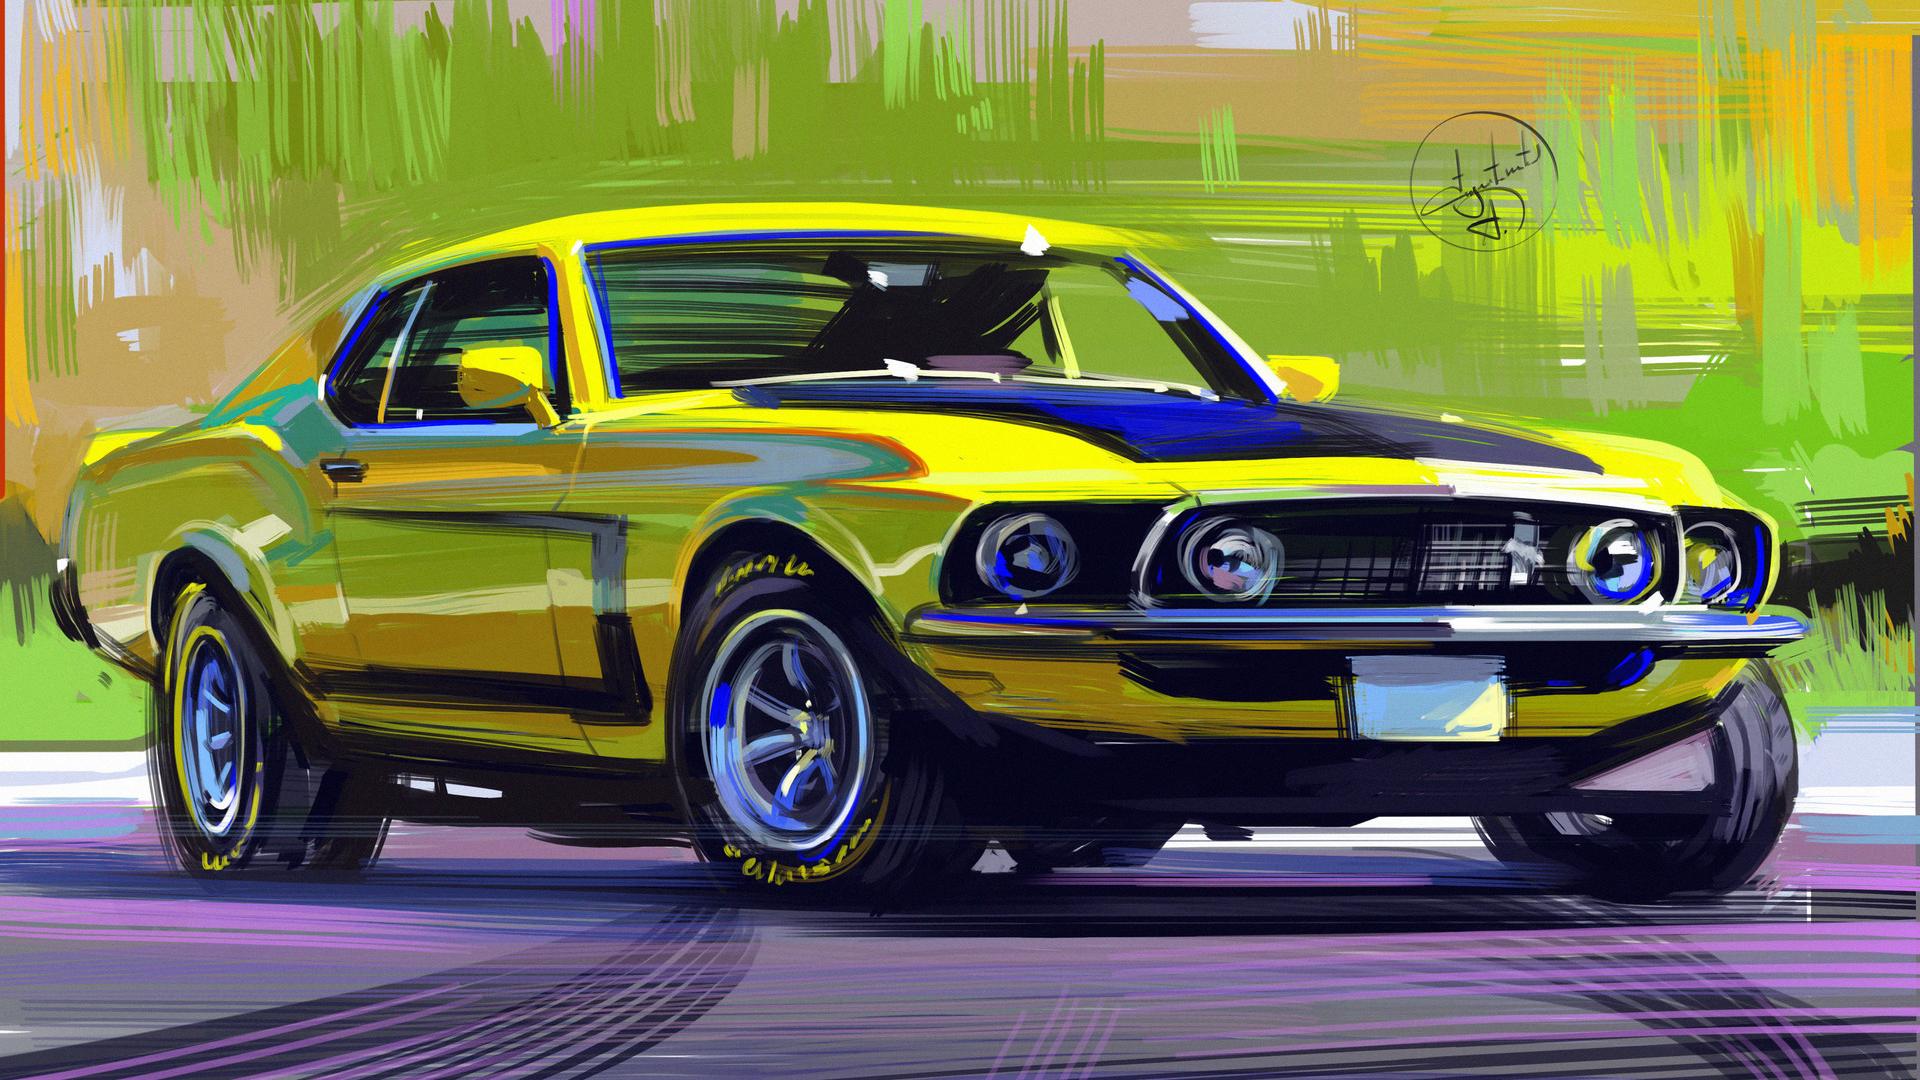 General 1920x1080 artwork Aleksandr Sidelnikov digital art Mustang (Car) yellow cars Ford Mustang car